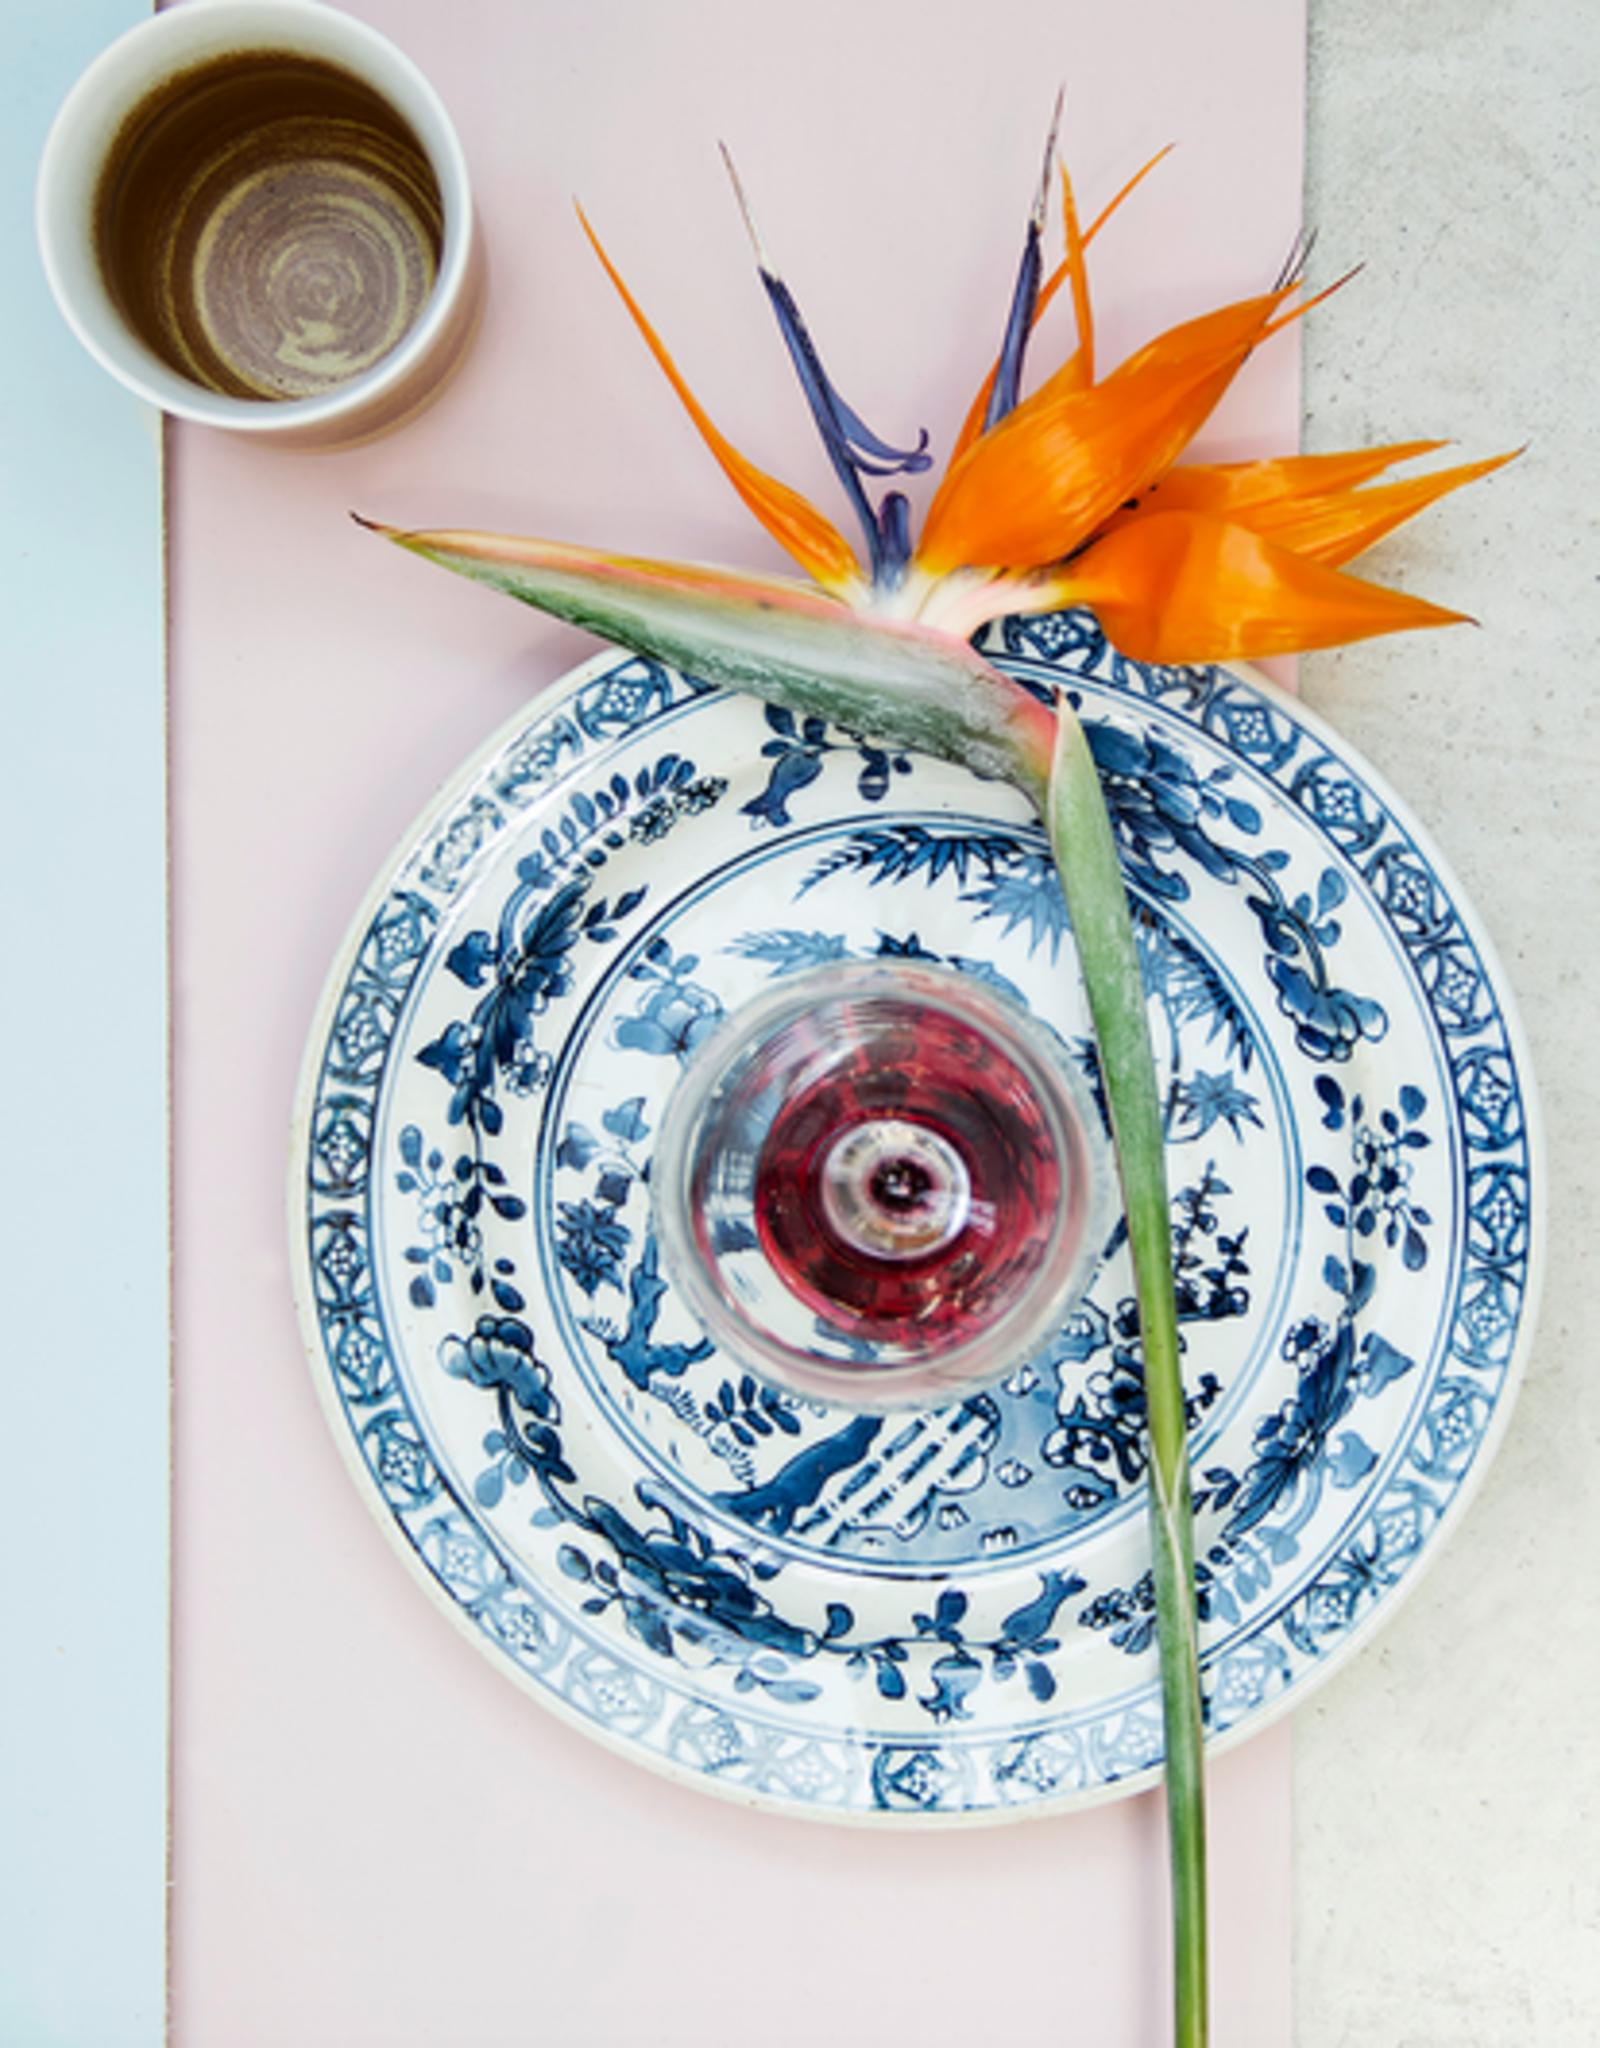 HK Living Kyoto ceramics handpainted plate